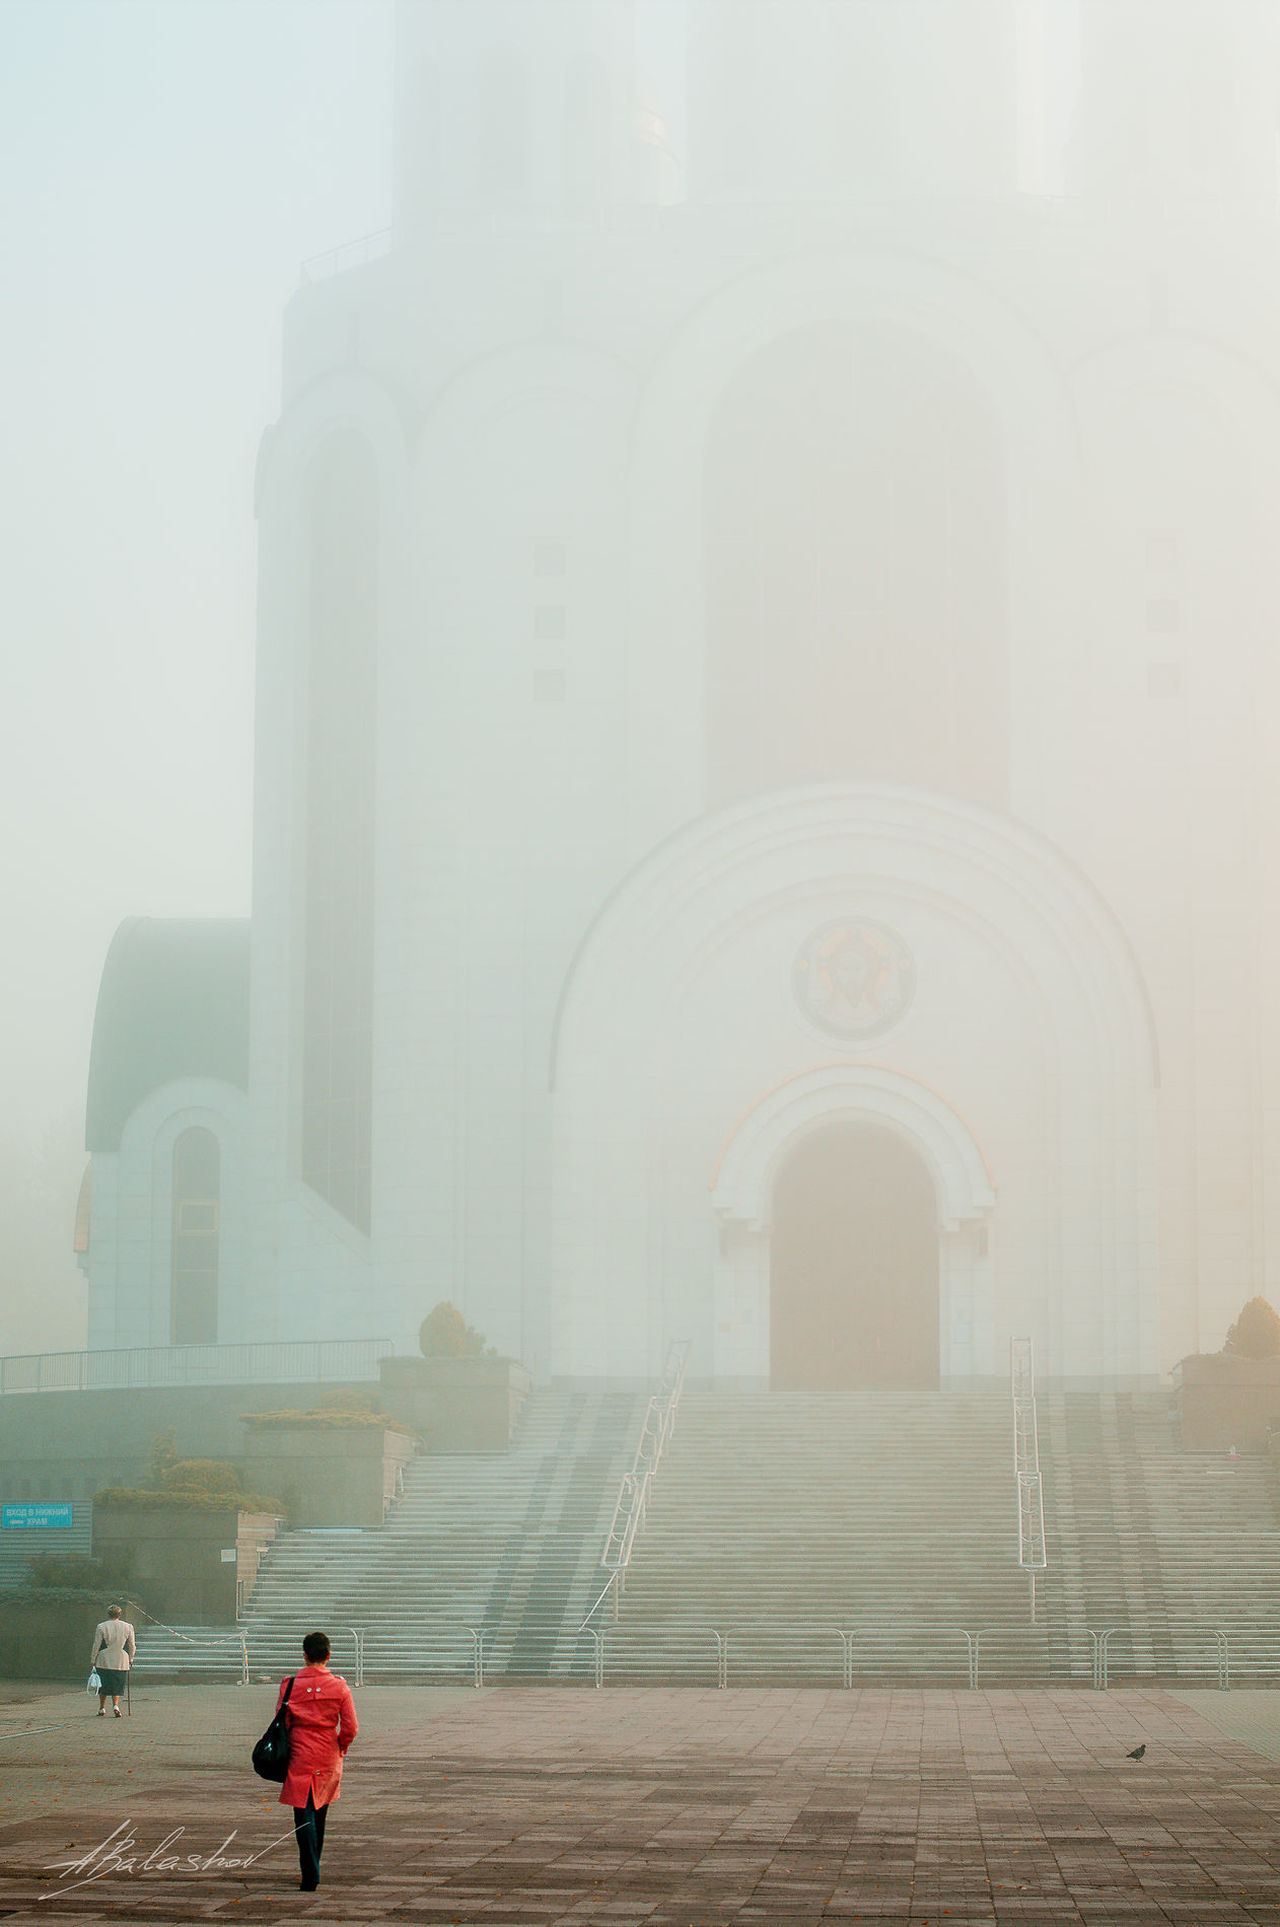 калининград Kaliningrad Streetphoto_bw Fujifilm X-Pro1 35mm Streetphotography Fujifilmru ХрамХристаСпасителя храмы России туман